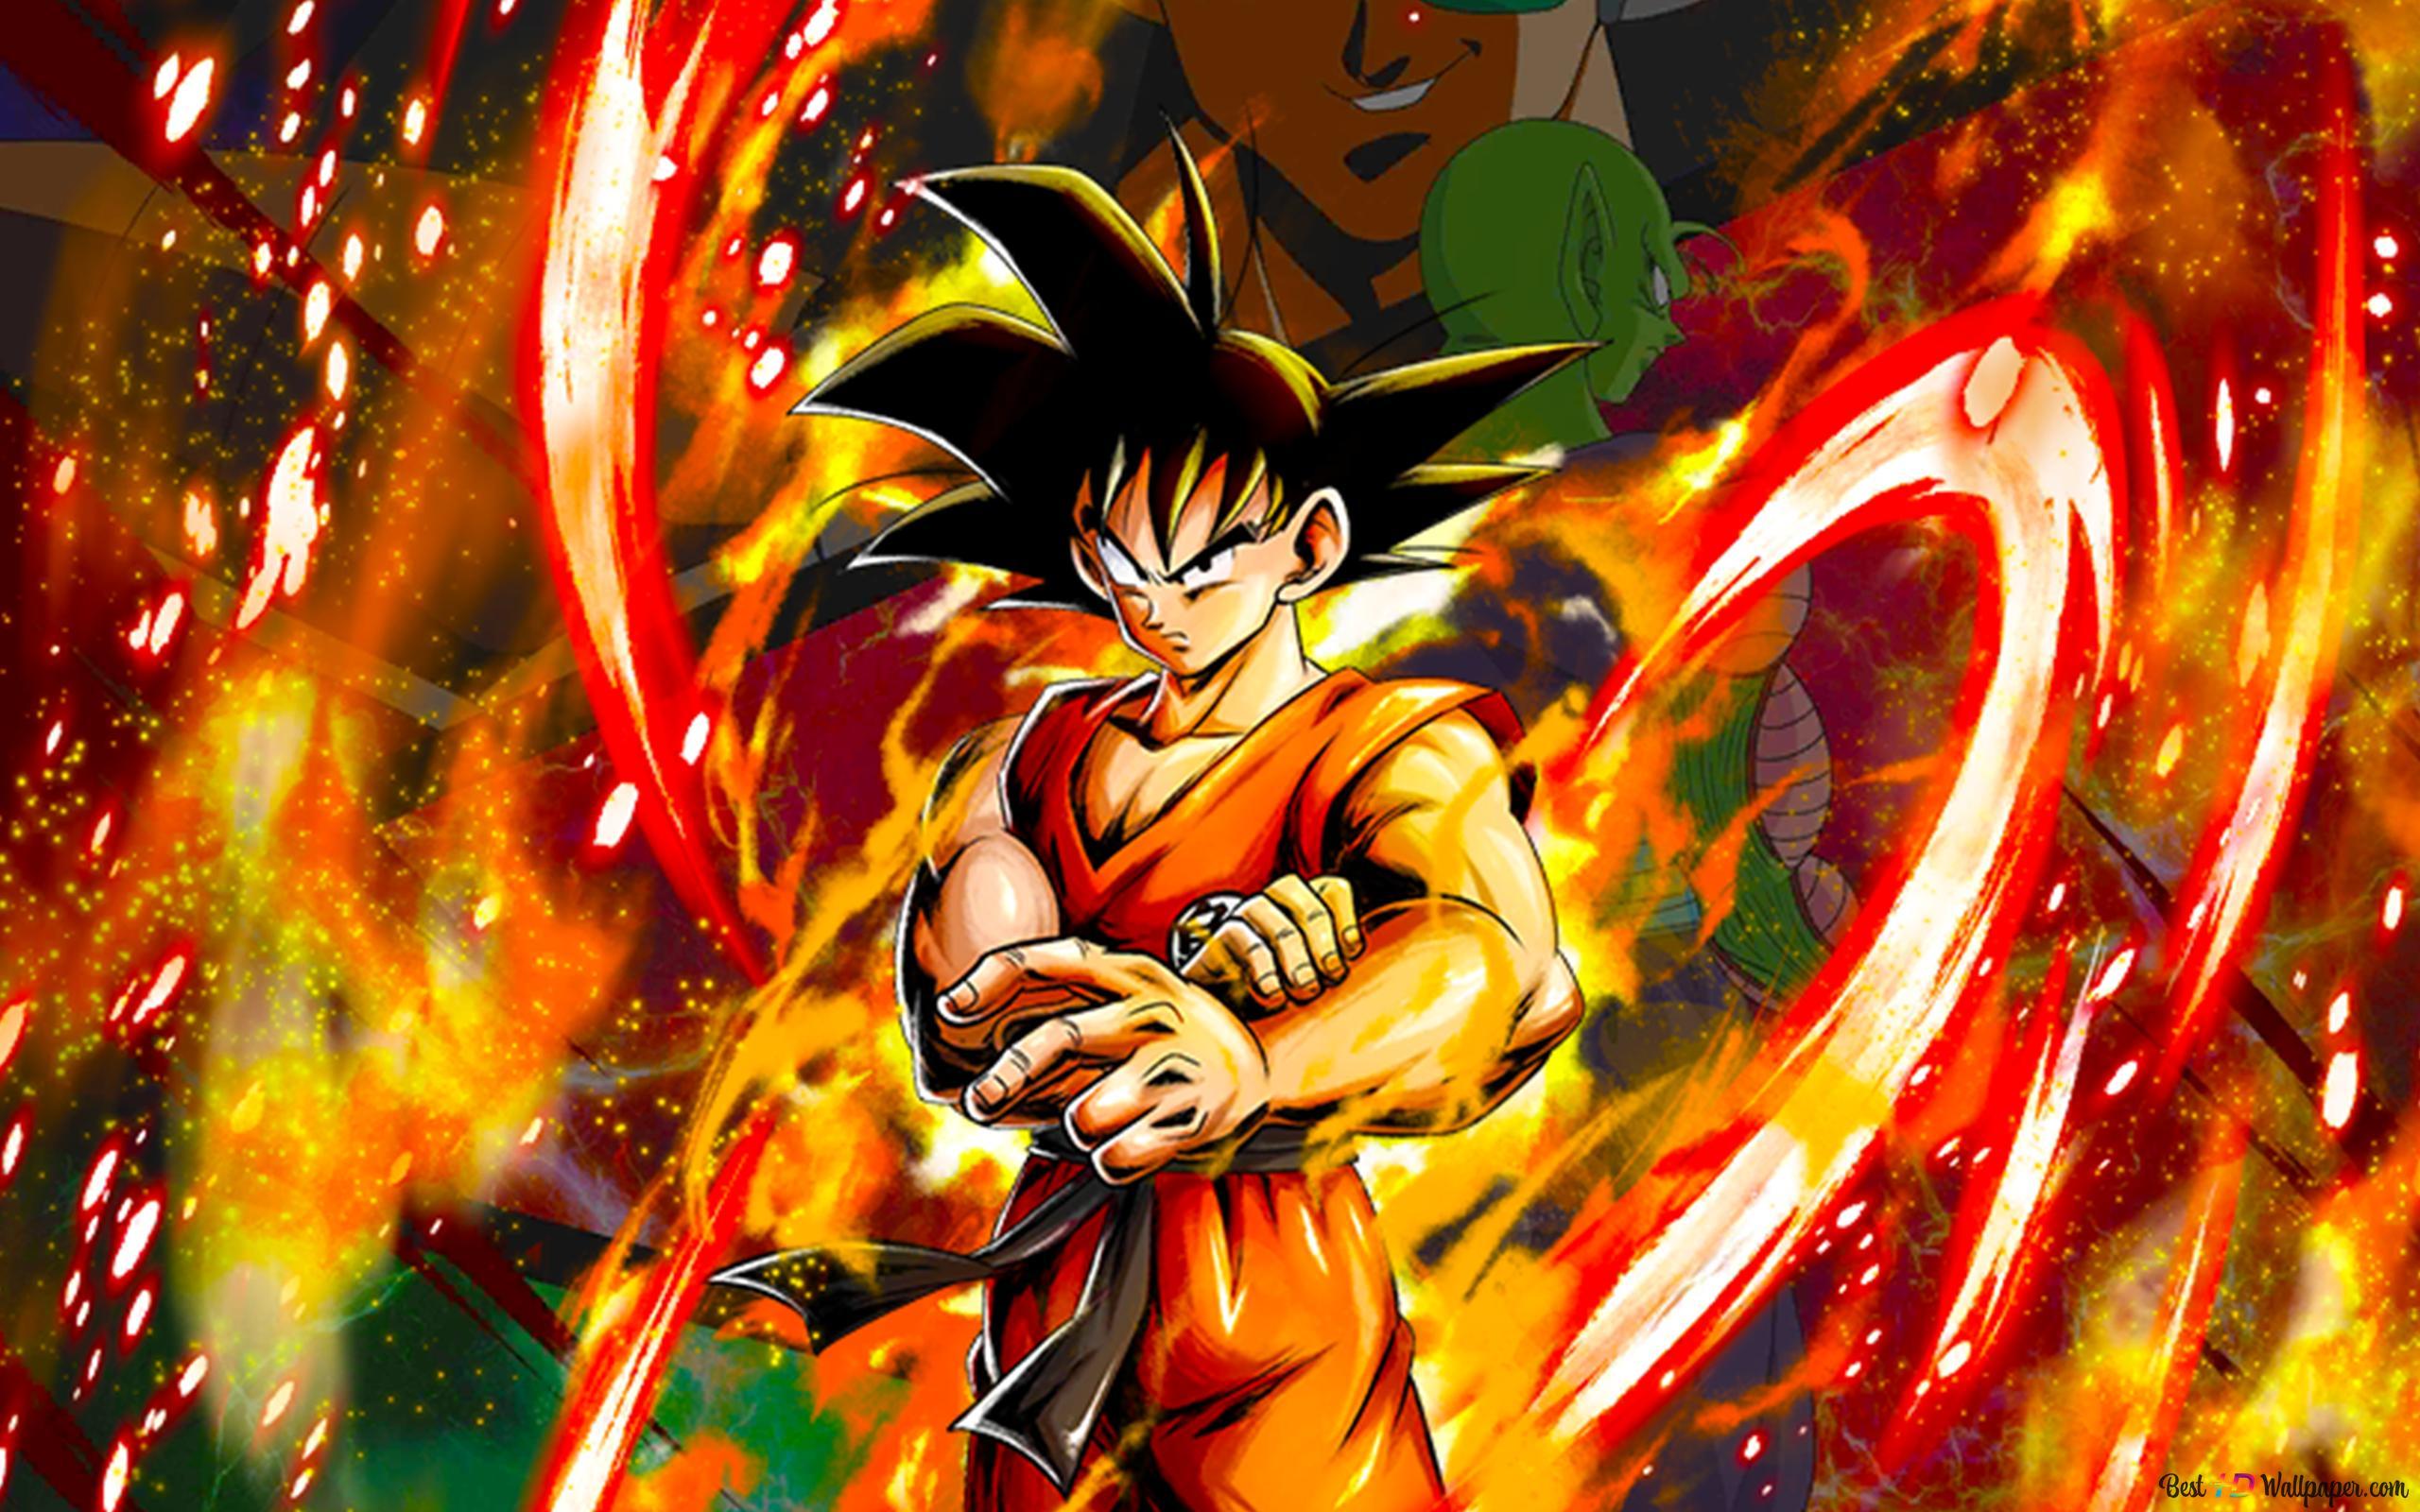 Goku Saiyan Saga Raditz Saga From Dragon Ball Z Dragon Ball Legends Arts For Desktop Hd Wallpaper Download